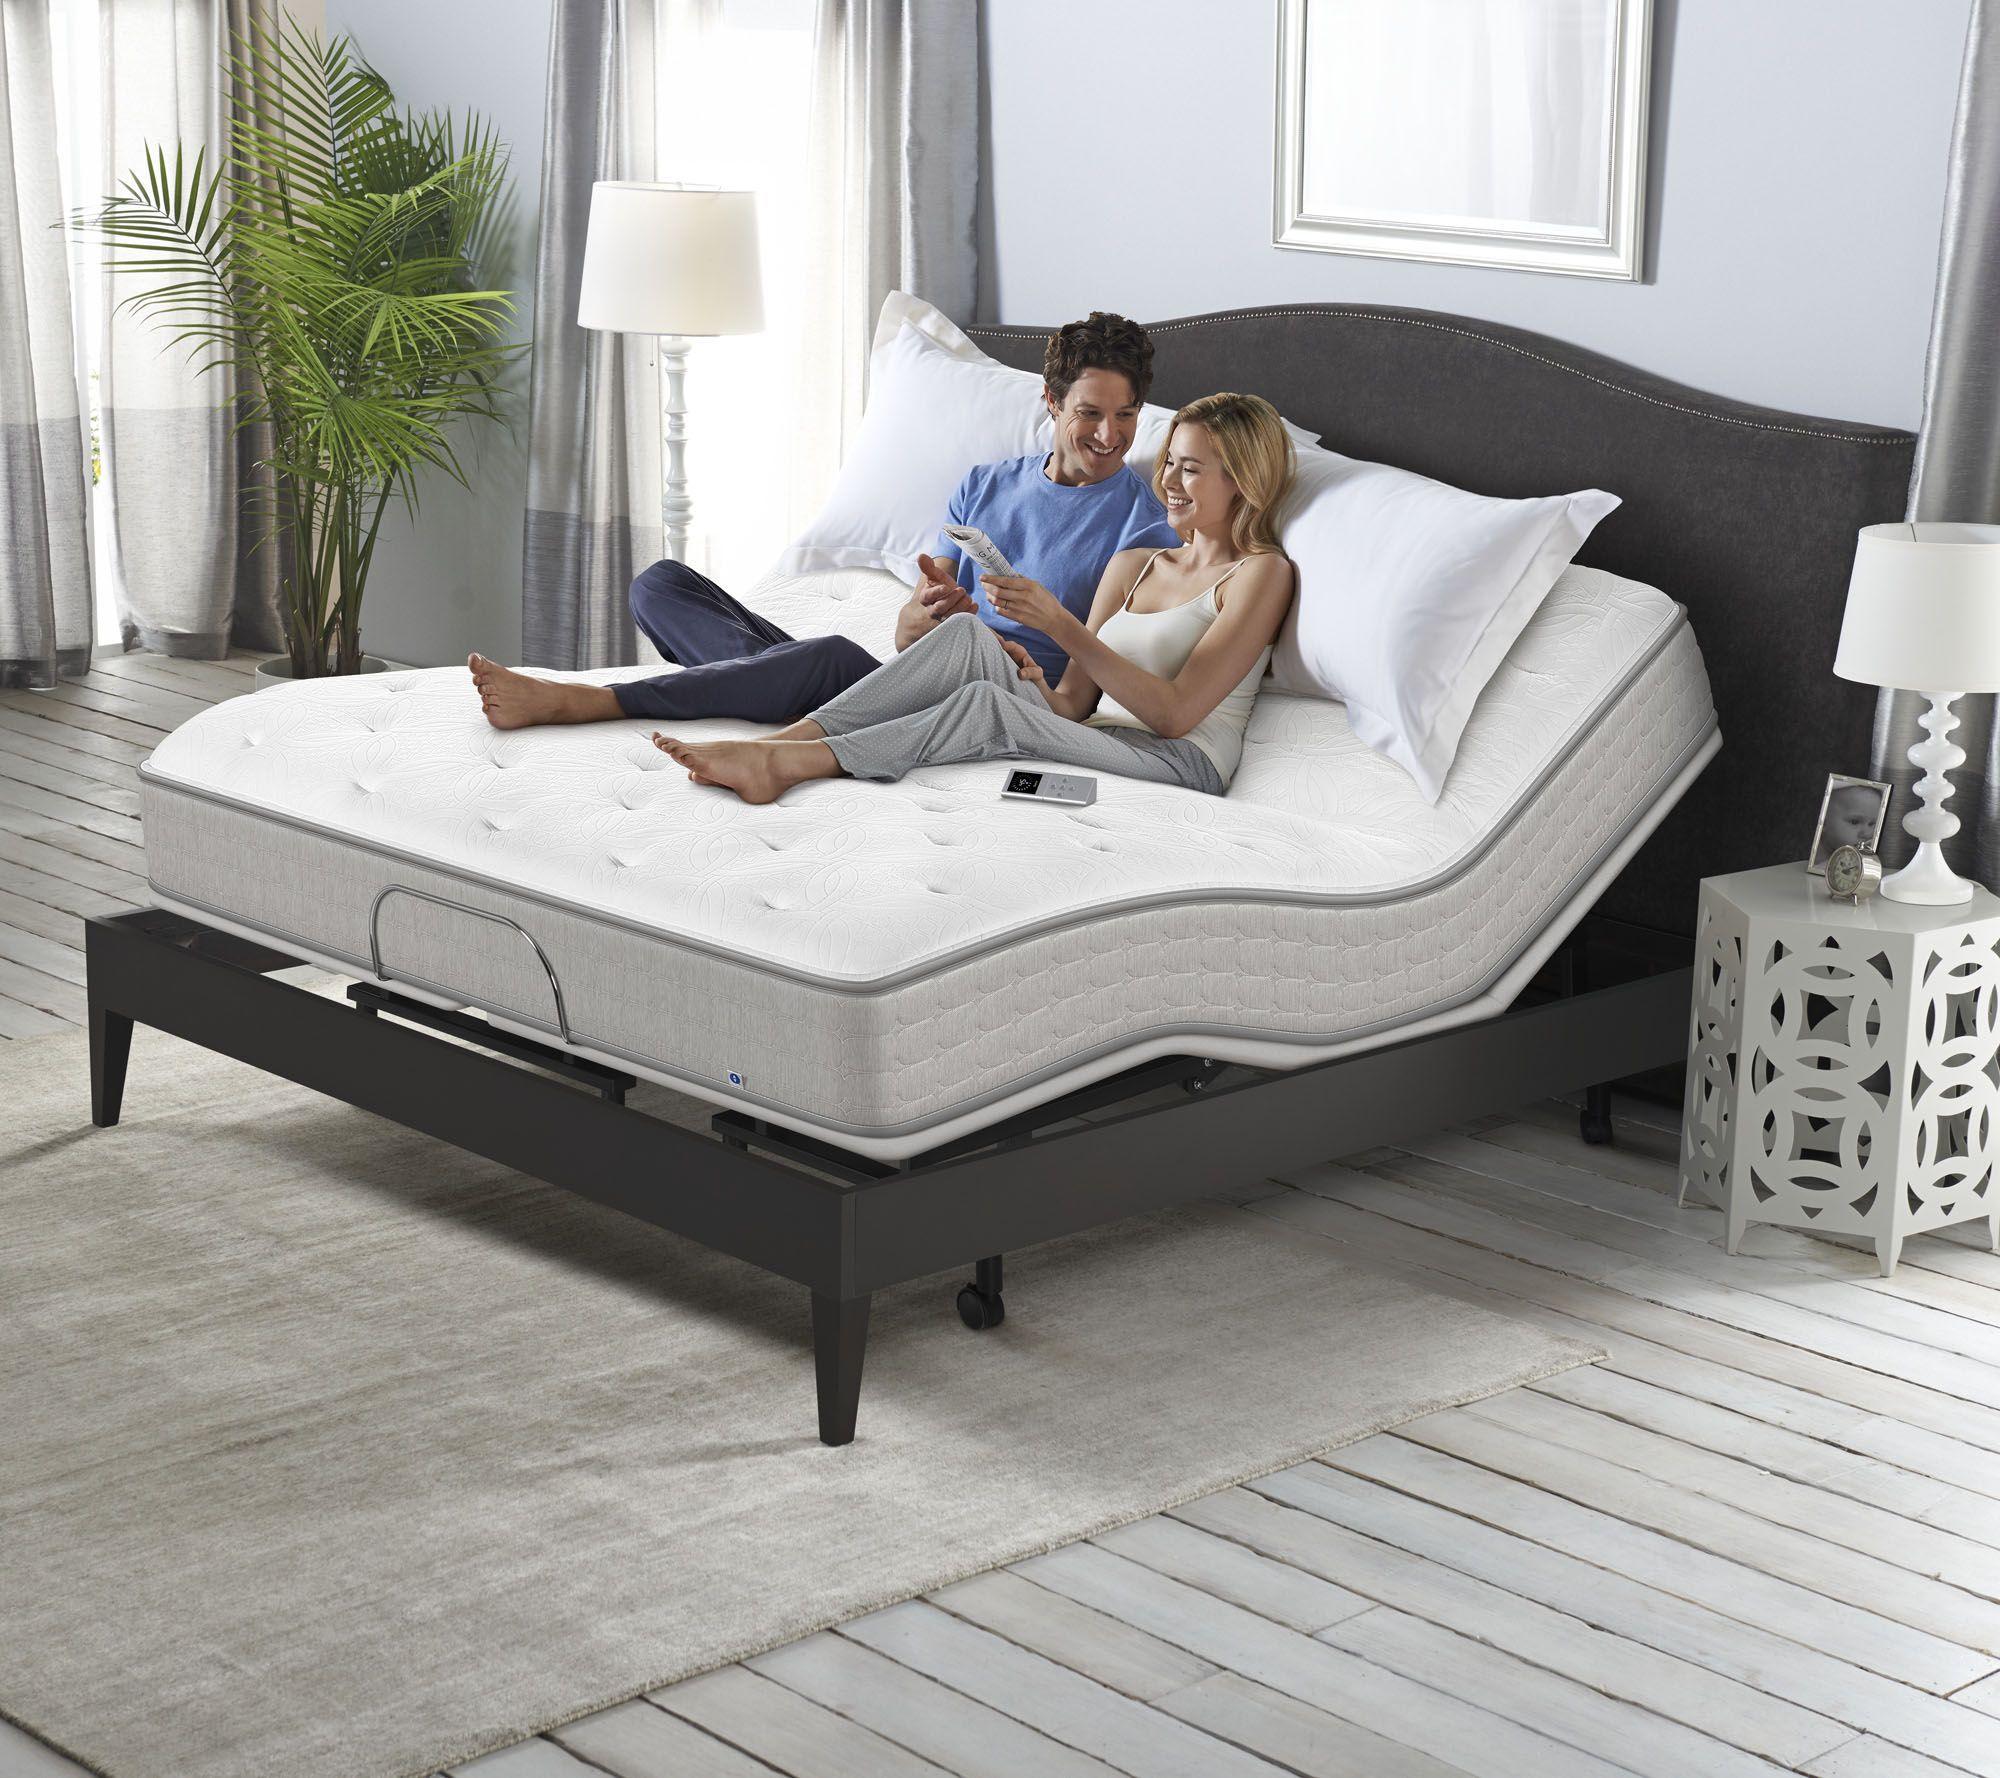 Sleep Number cSE Queen Adjustable Base Mattress Set - H215417